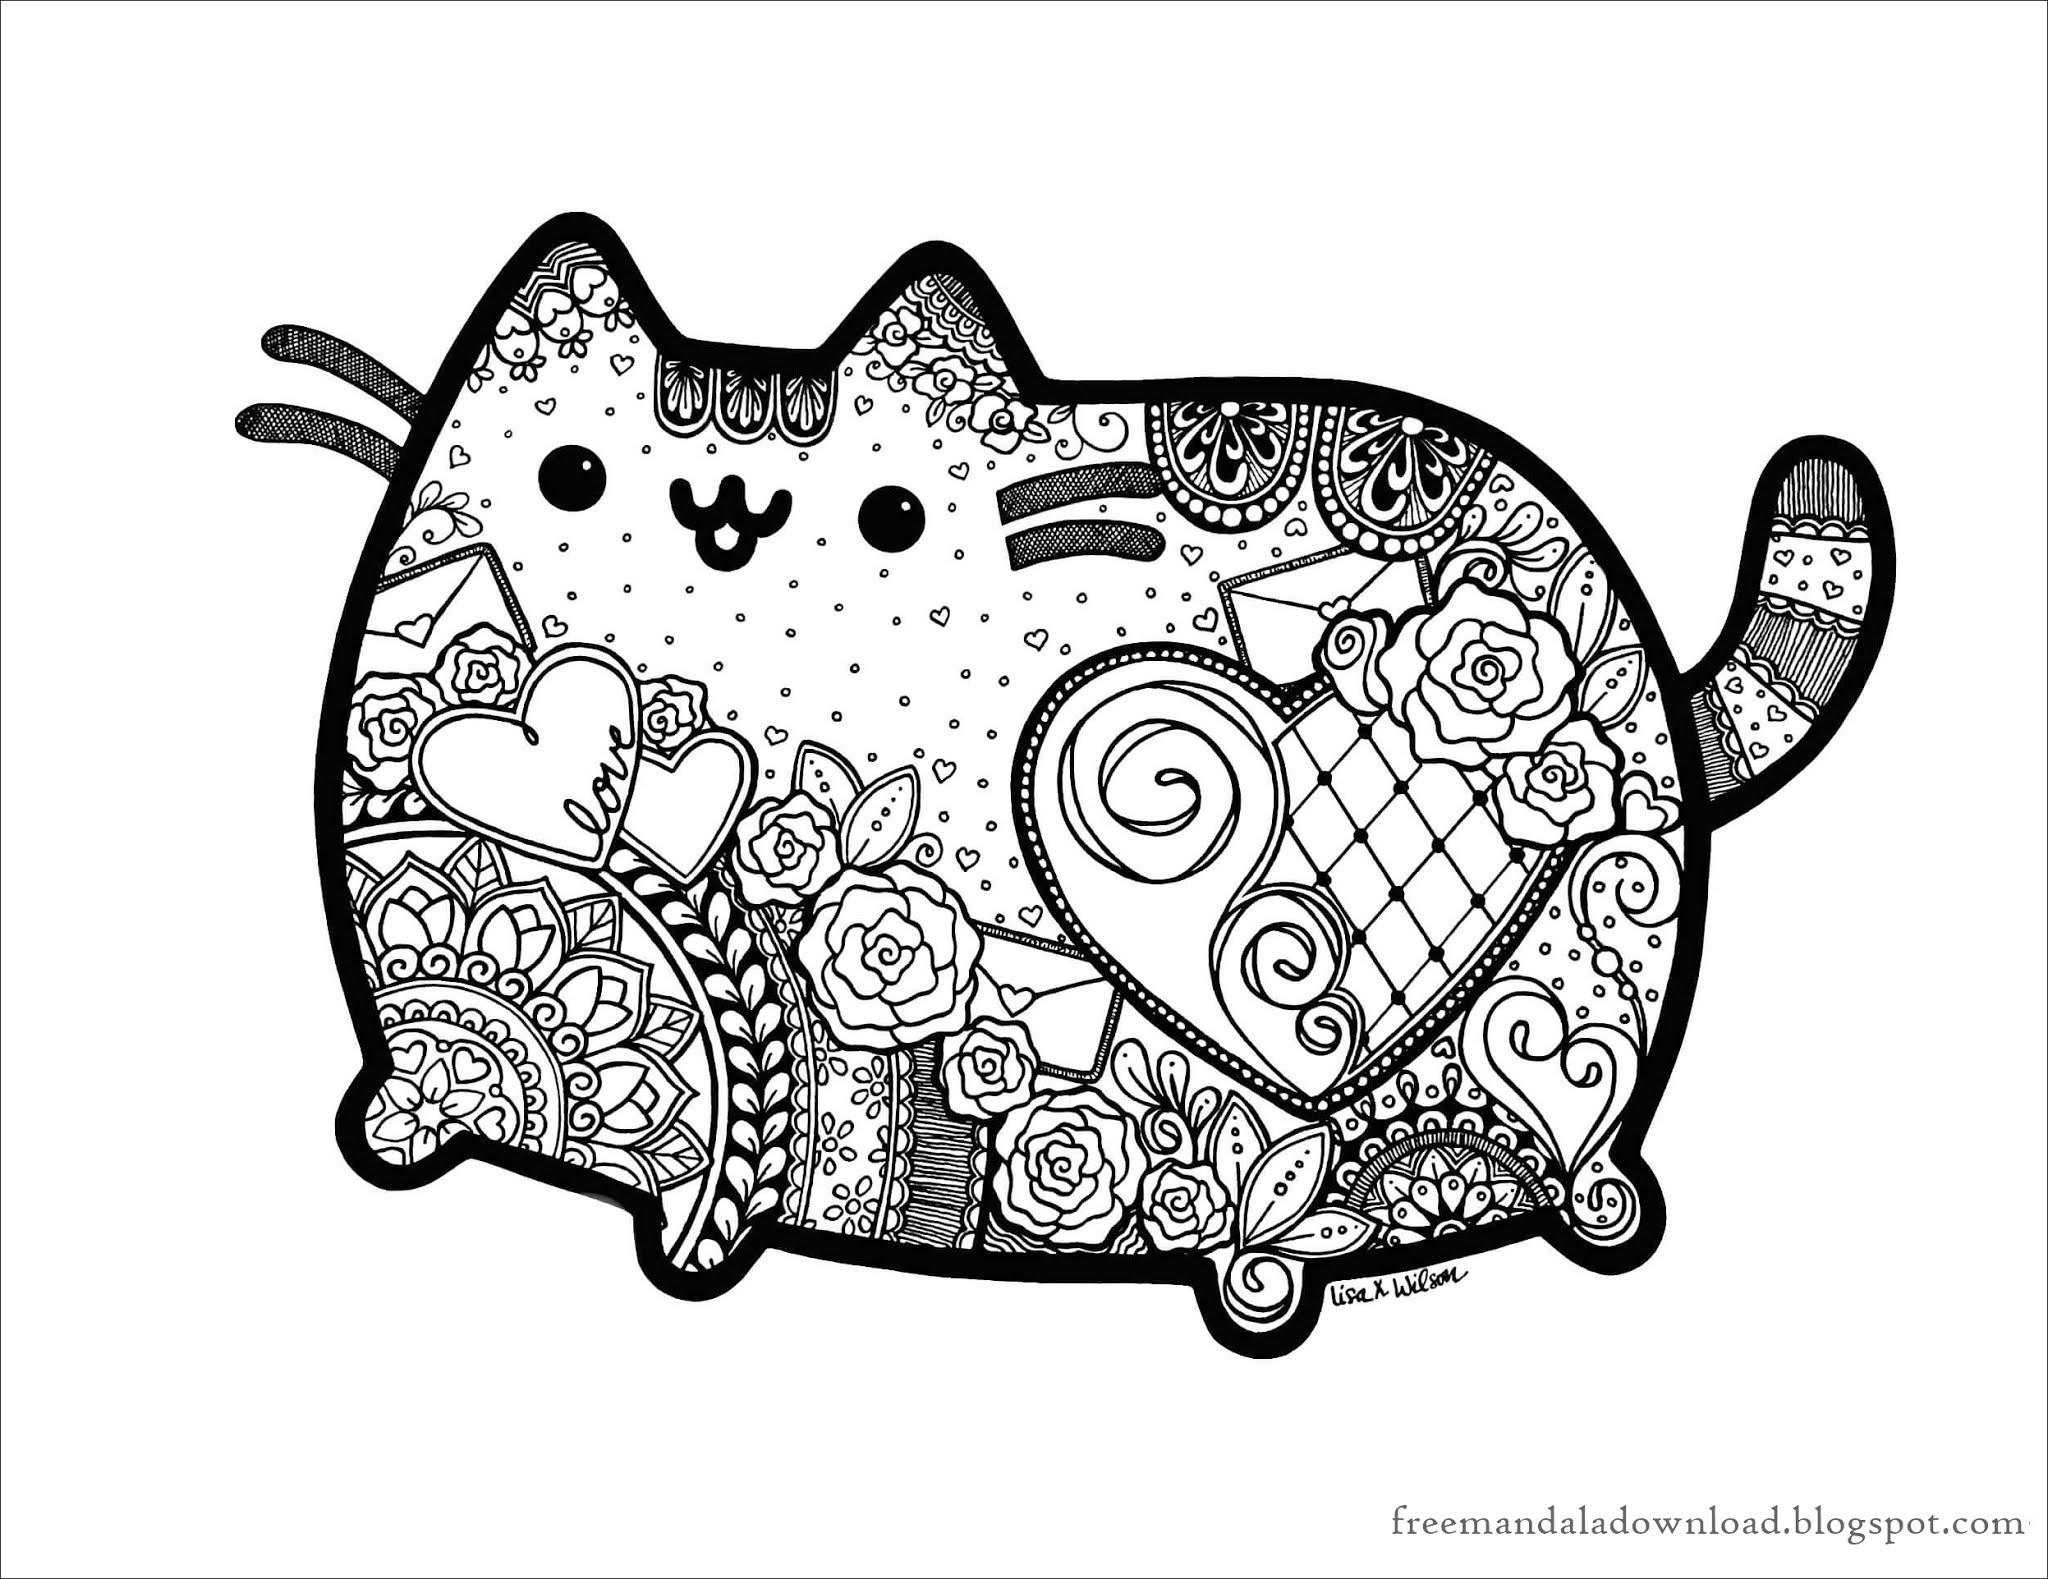 katzen mandala malbuch pdf-cats mandala coloring book pdf